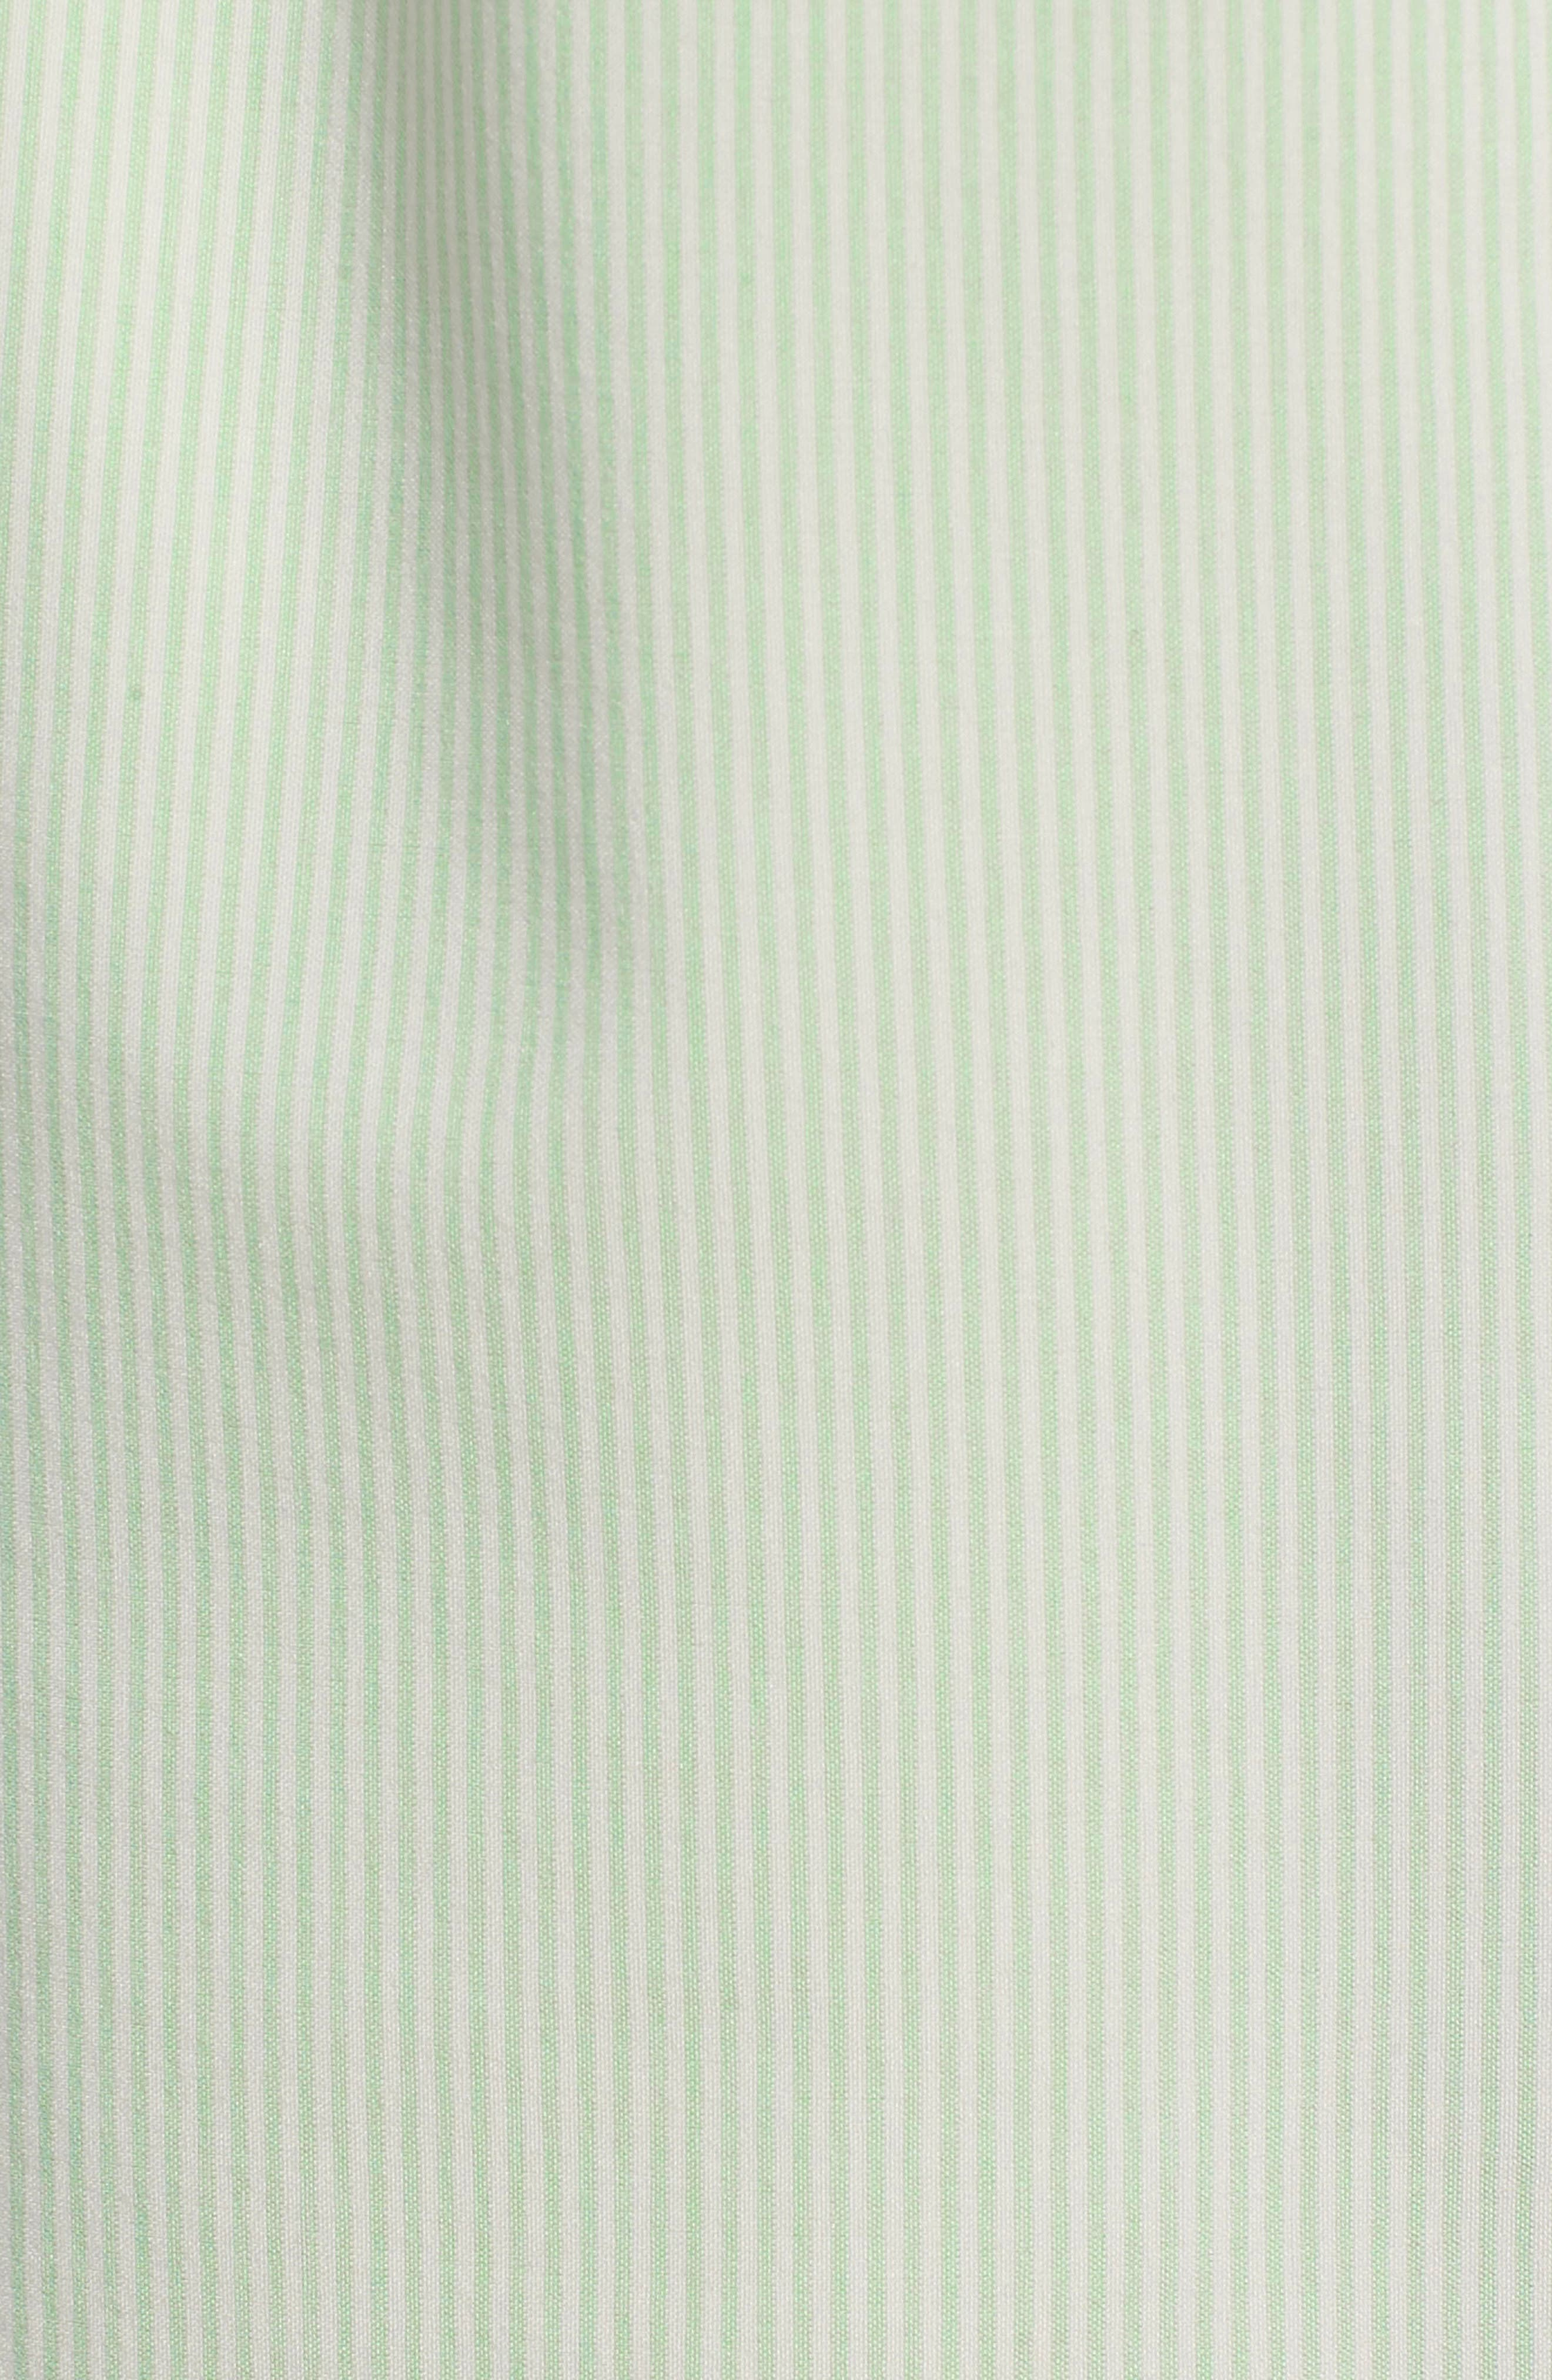 Spot Swim Trunks,                             Alternate thumbnail 5, color,                             SEA GLASS GREEN